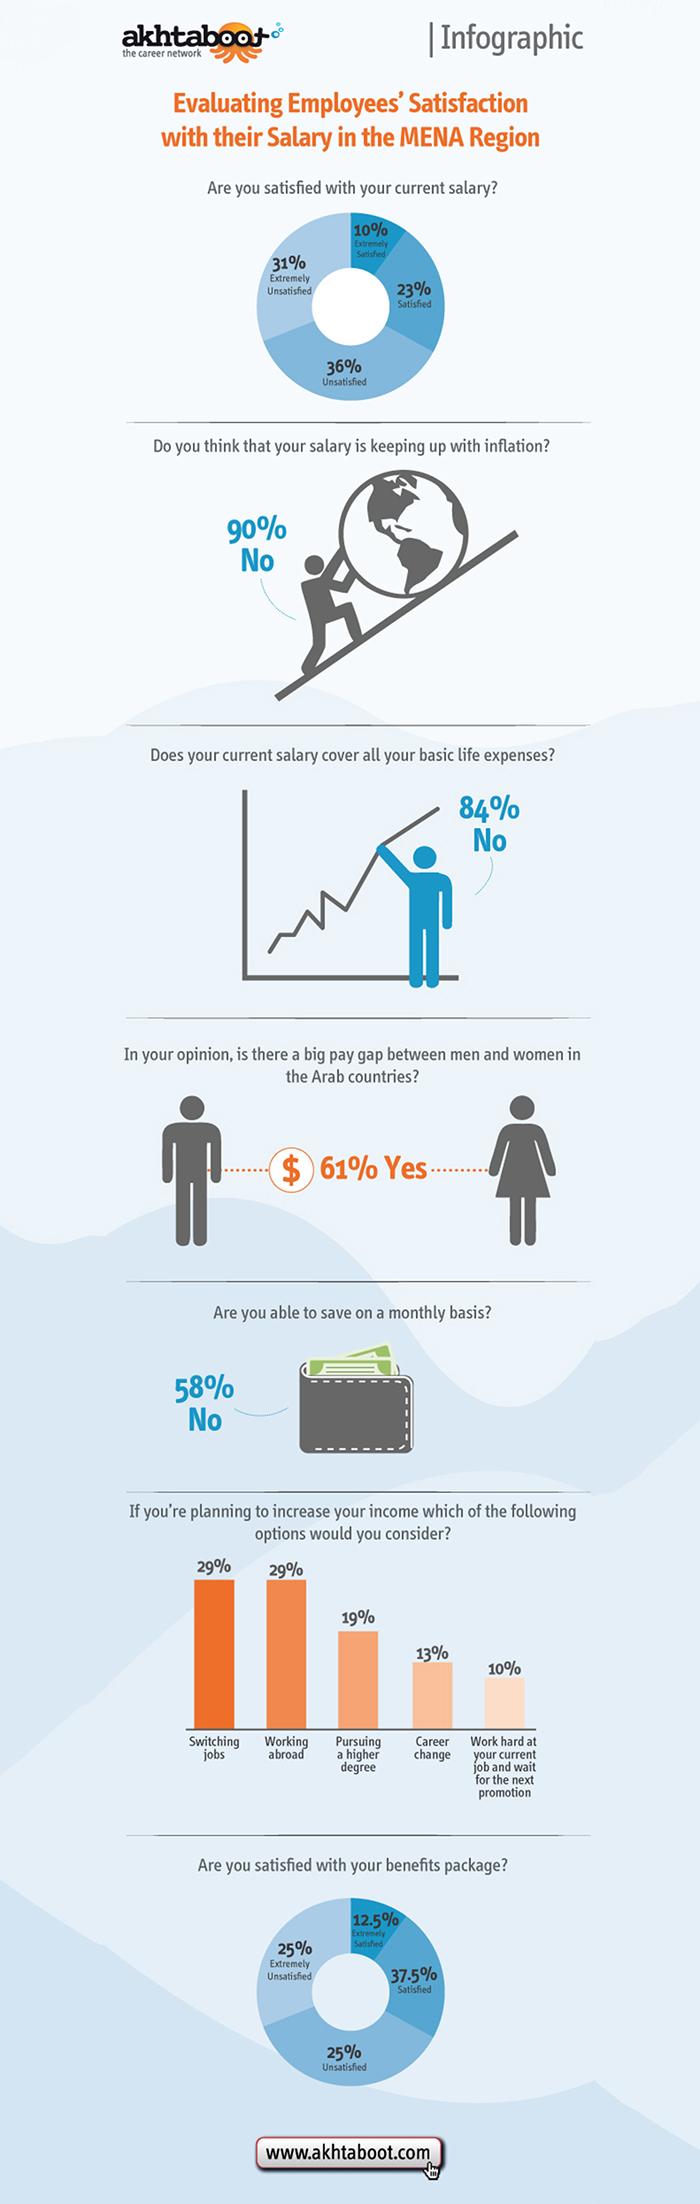 infographic_2014_Q1